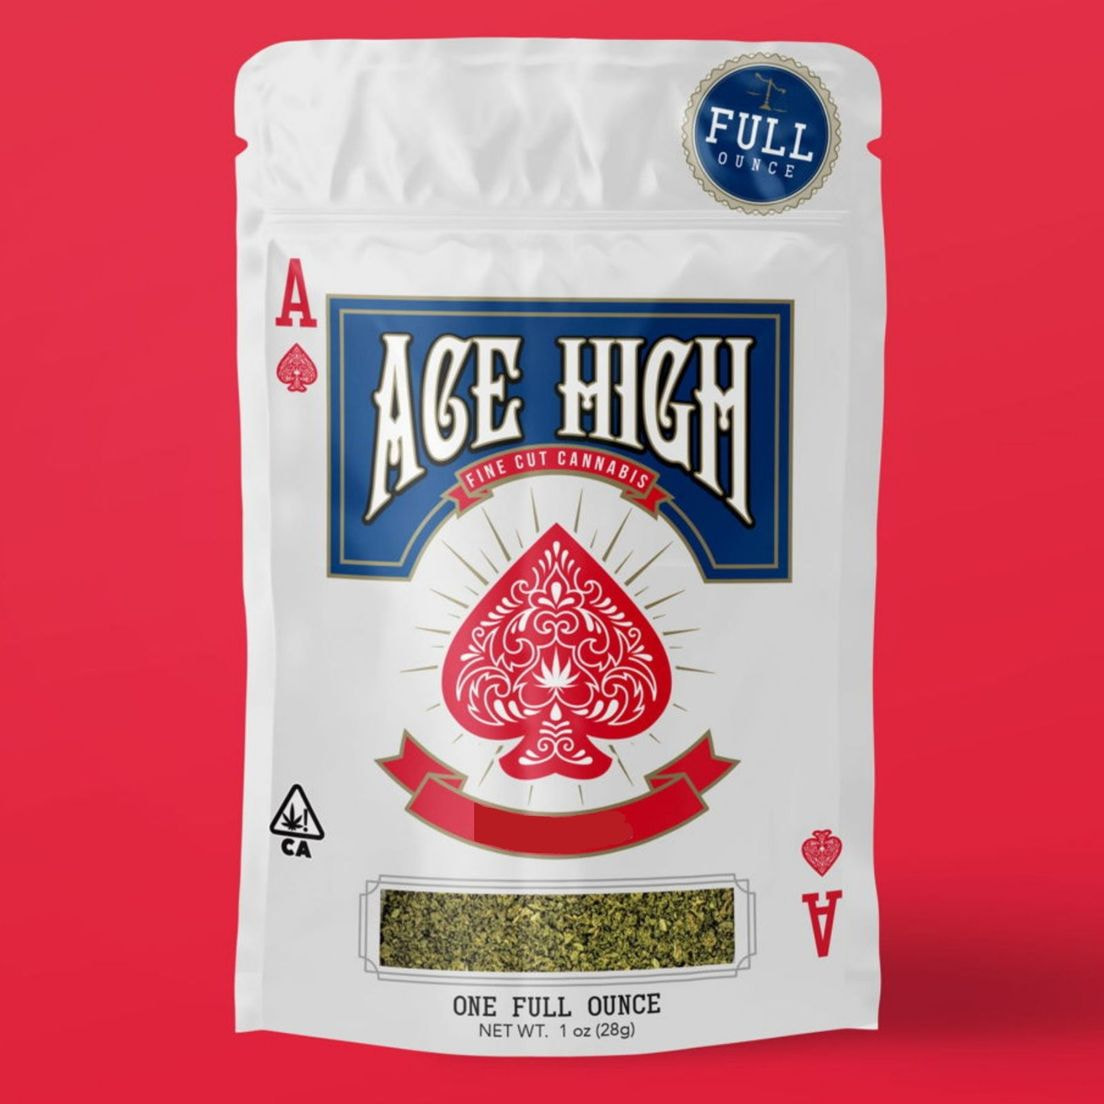 A. Ace High 28g Shake Flower - Chem Reserve (~19%)